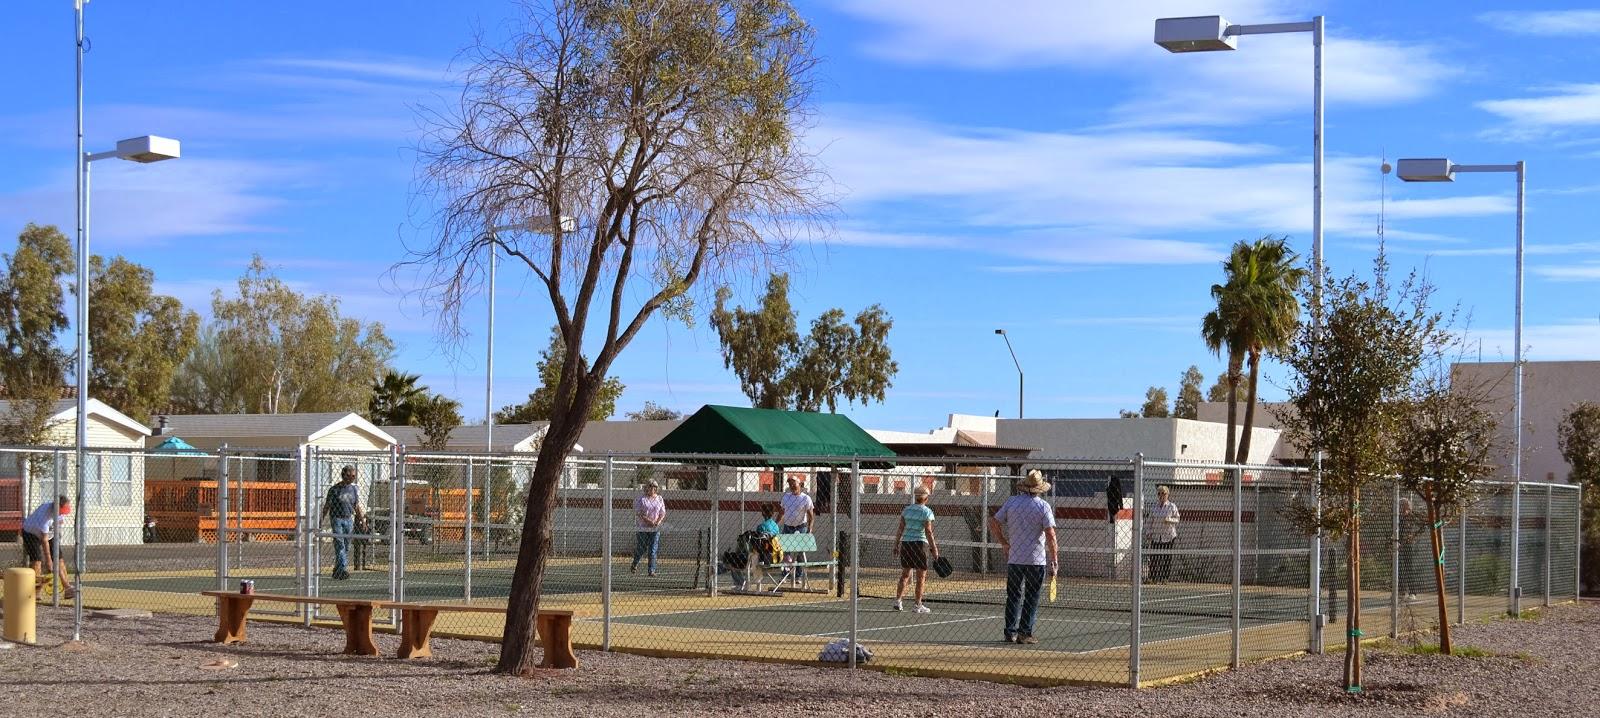 No Bad Days Rving Casa Grande Rv Resort Arizona